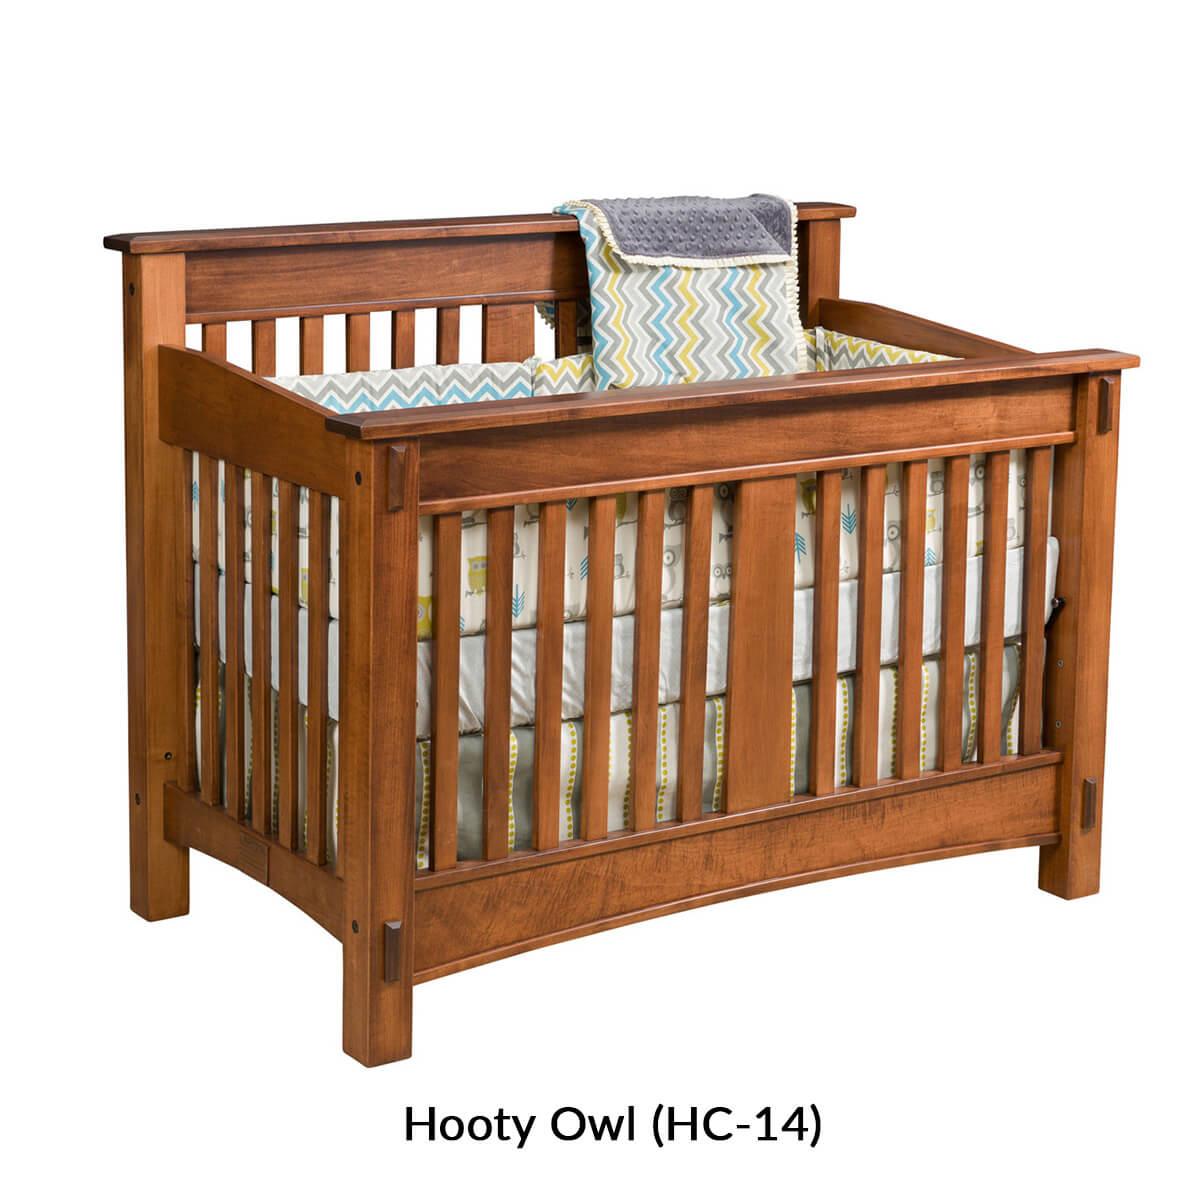 21.-hooty-owl-hc-14-.jpg